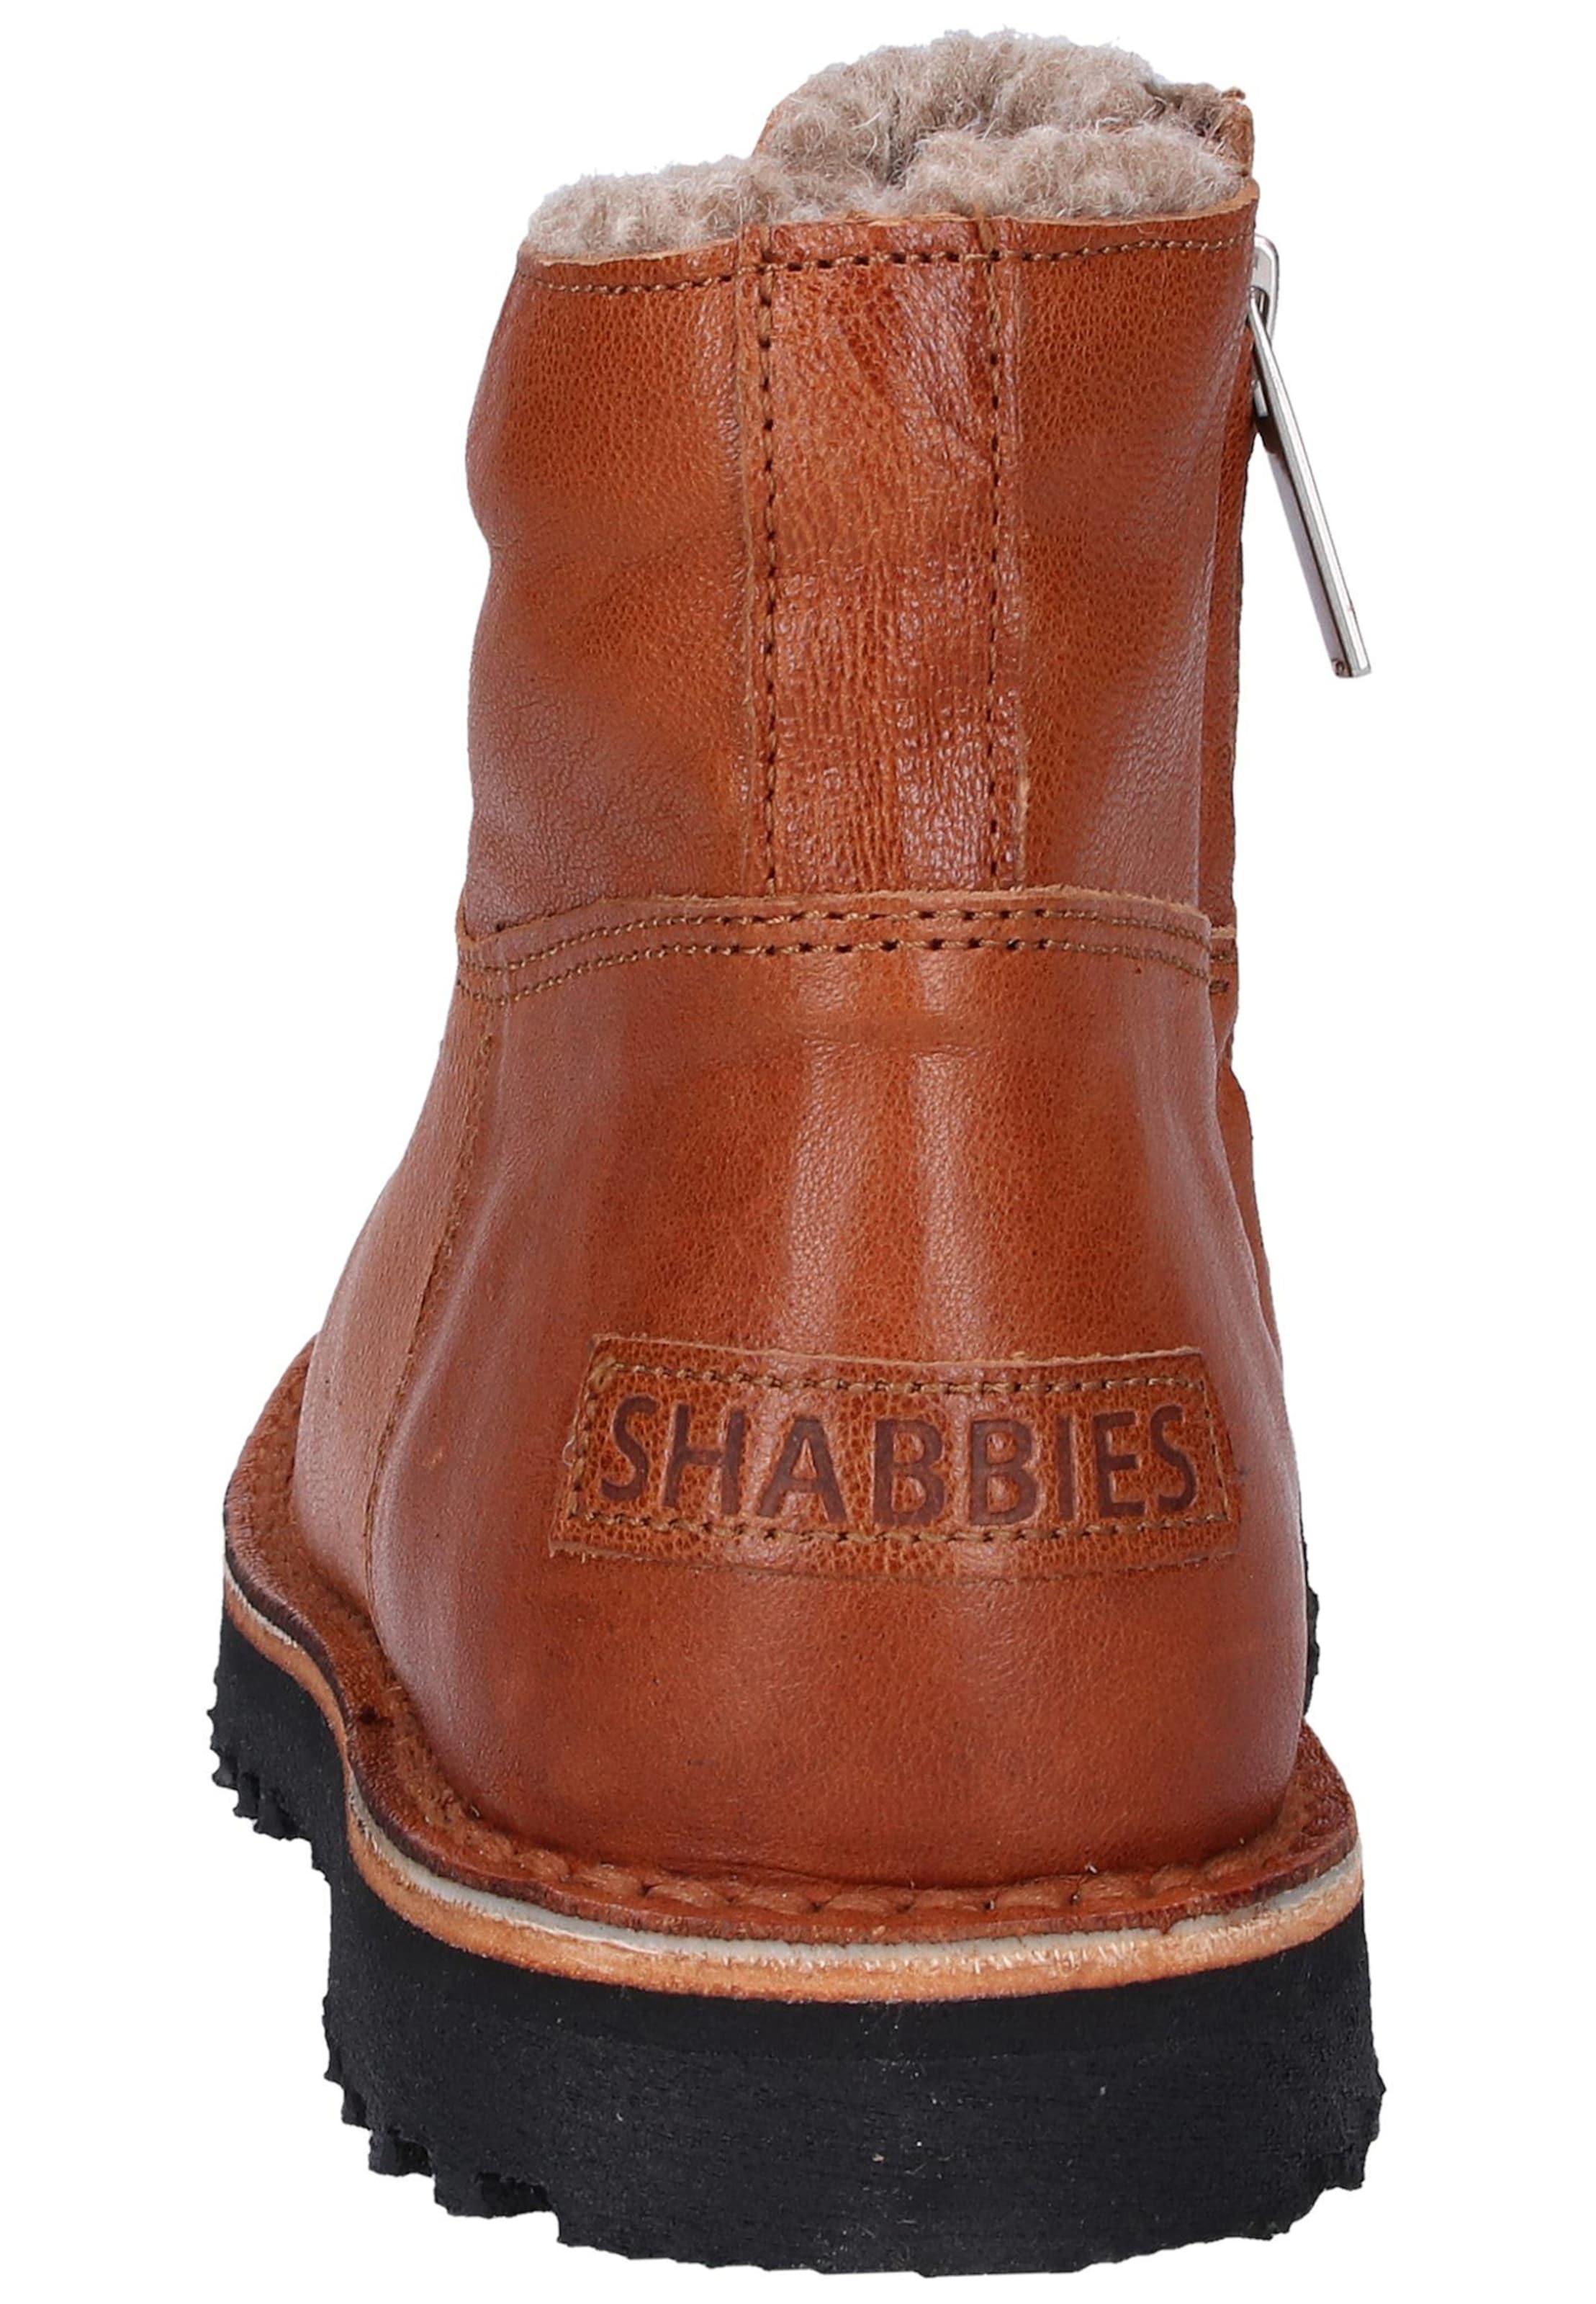 In Shabbies Shabbies Shabbies In Cognac Amsterdam Cognac Amsterdam Stiefelette Amsterdam Stiefelette Aj54LR